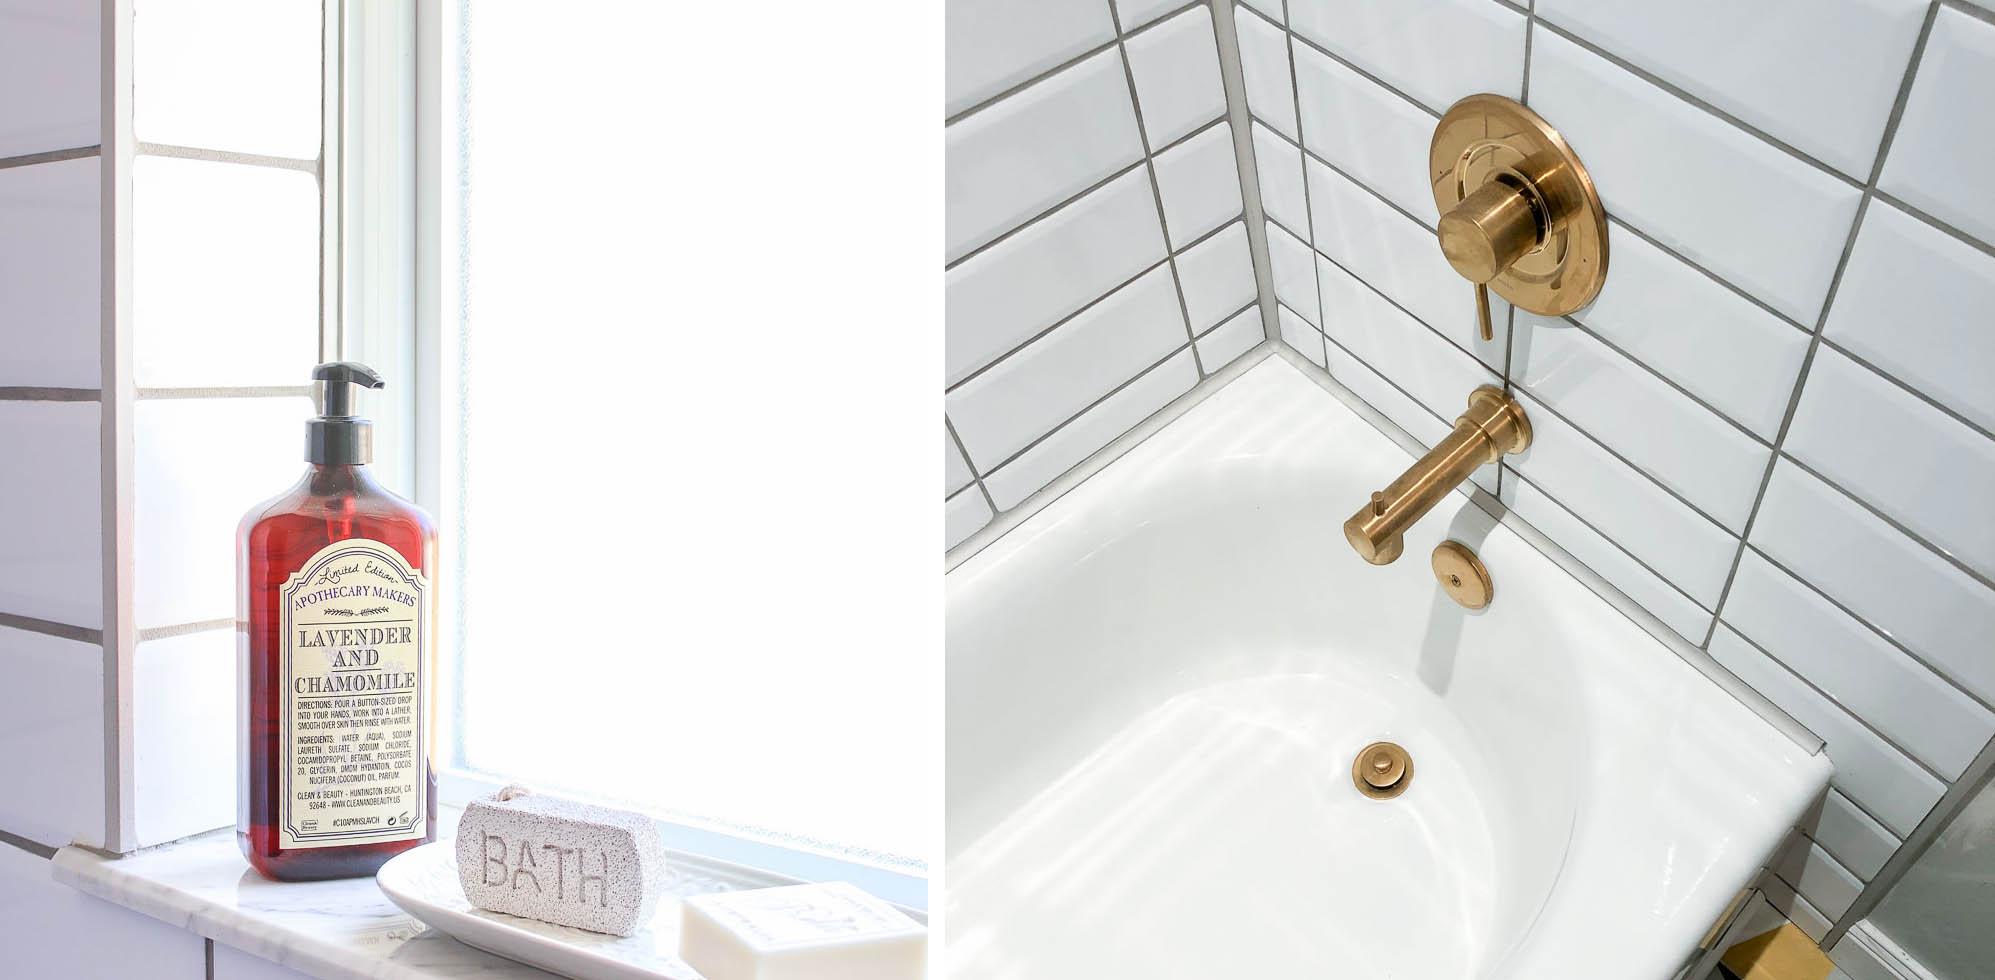 Millies Remodel: Tiling Main Bathroom using tile profiles for caulk free shower tub